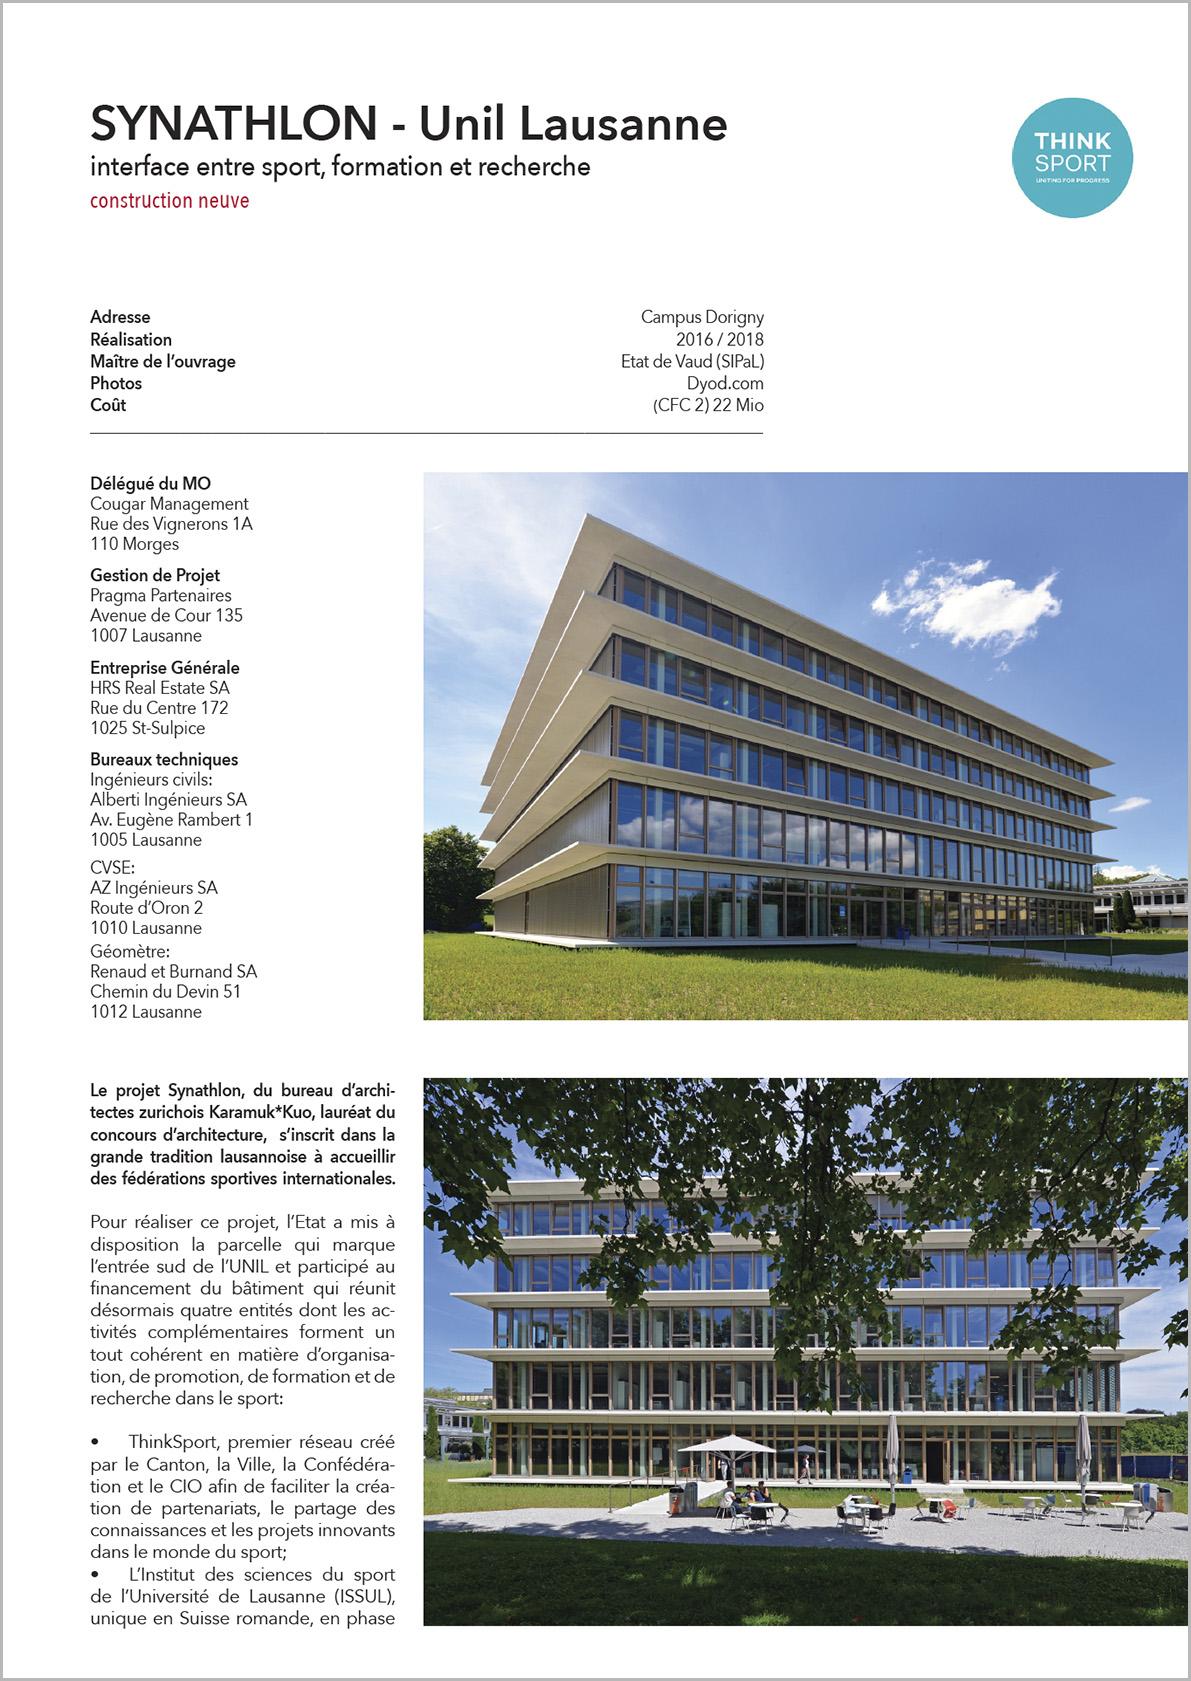 Unil-synathlon Lausanne